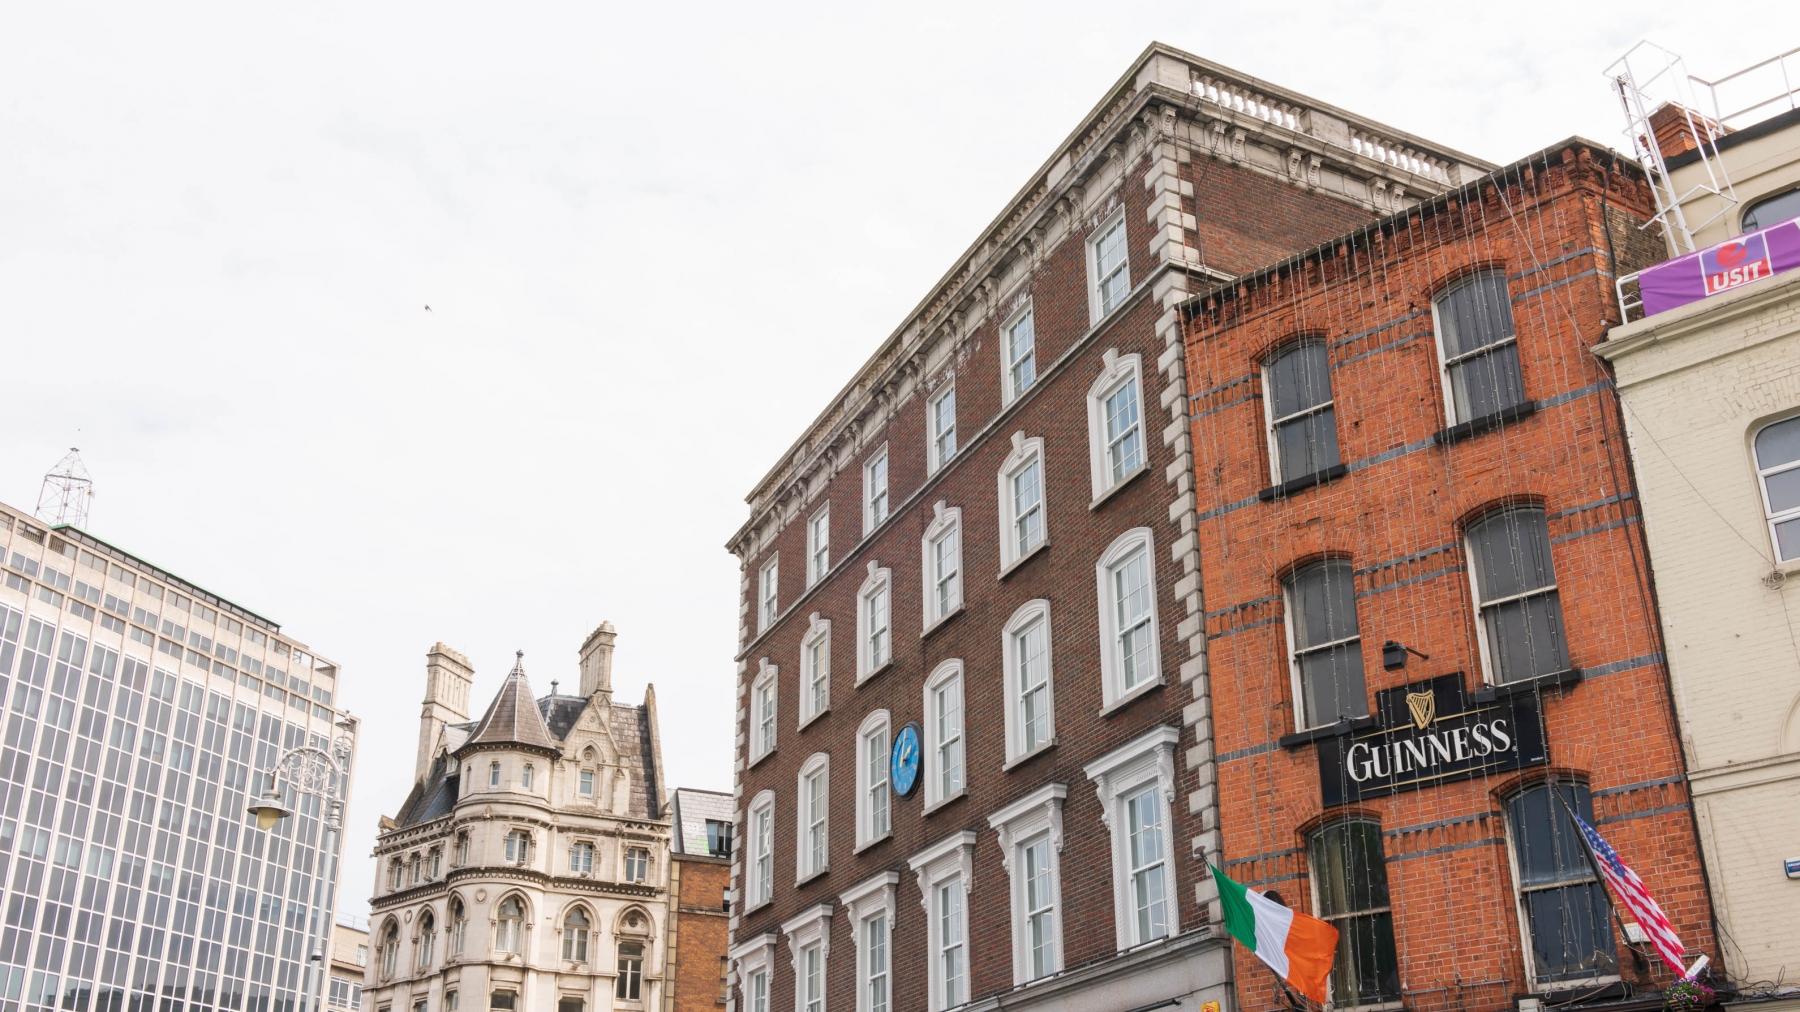 Beautiful Architecture around the Temple Bar area, Dublin.